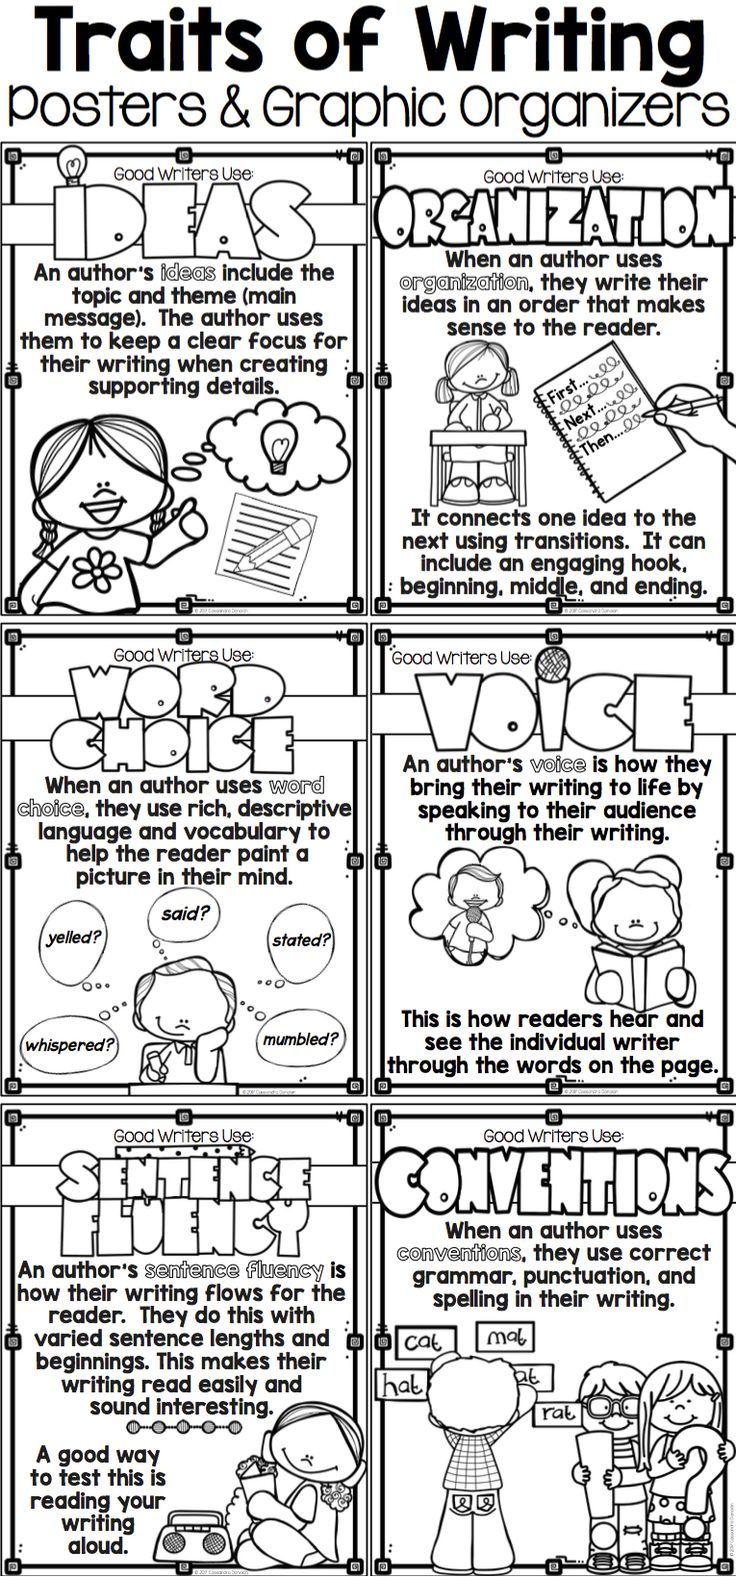 Traits Of Writing 8 Six Traits Posters Word Wall And Flashcards Flashcards Homeschool Six Traits Teaching Writing Organization Writing Traits [ 1577 x 736 Pixel ]